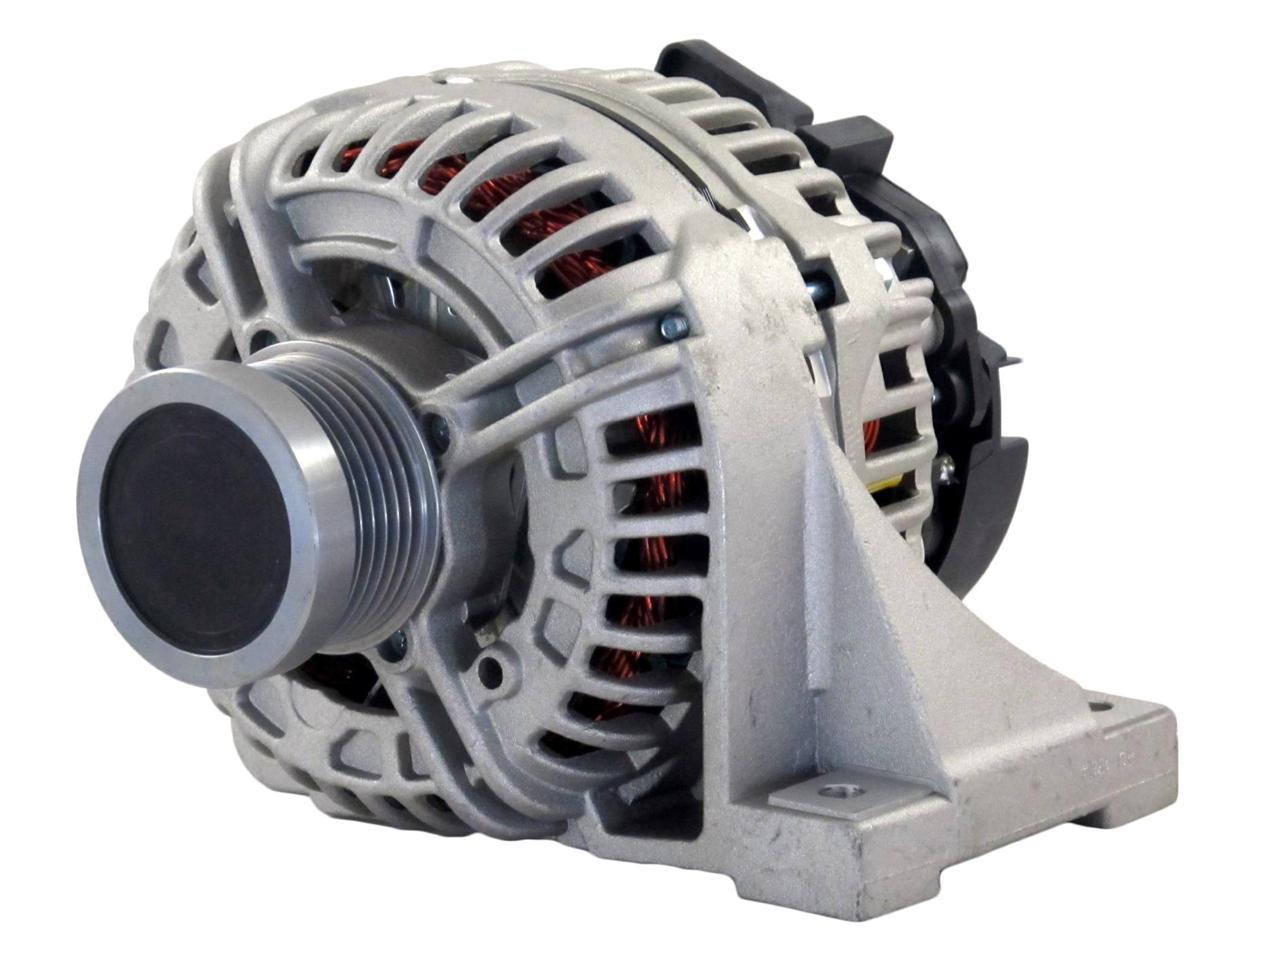 Volvo C70 1999 Fuse Box Manual Of Wiring Diagram V70 Alternator Location Free Engine Image